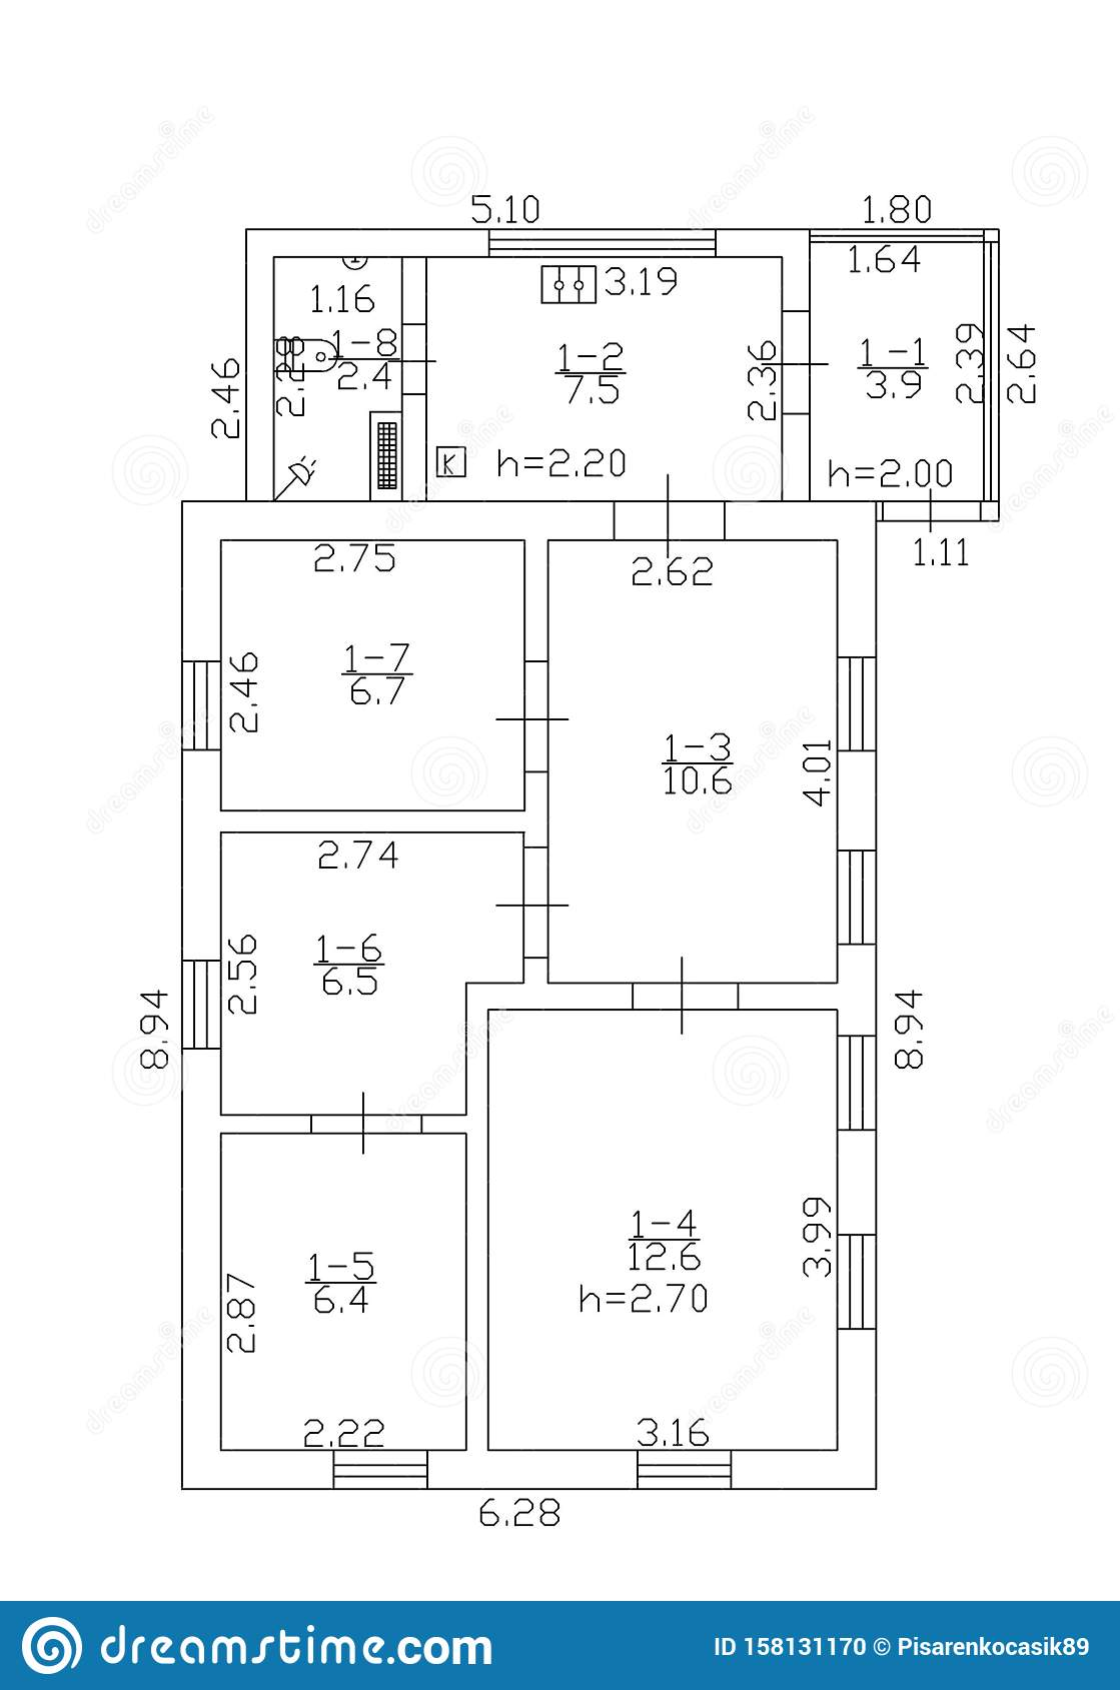 Floorplan Illustration Floor Plan Autocad Stock Illustration Illustration Of Level Architect 158131170